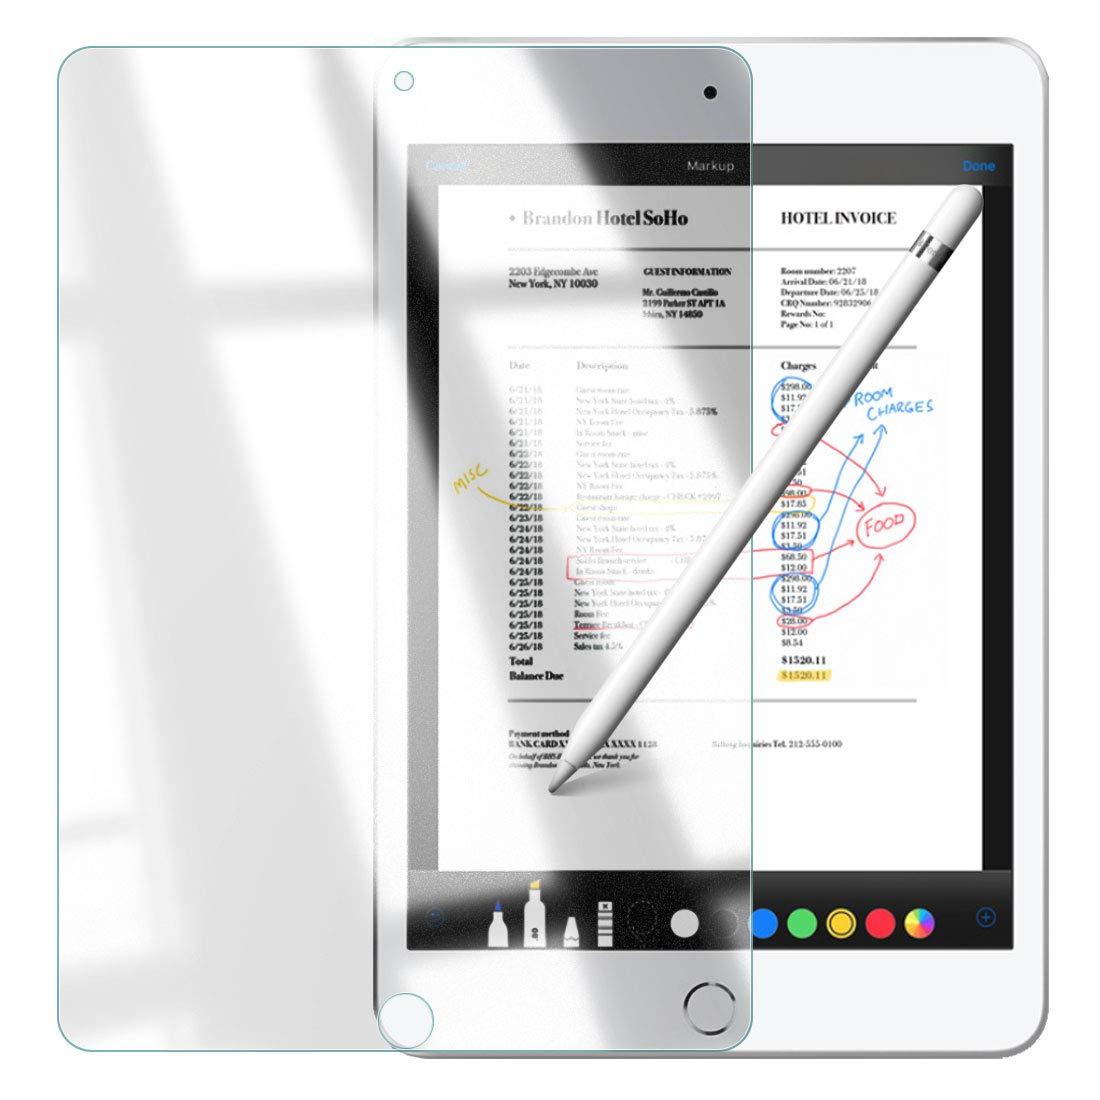 iPad Air 10.5 第3世代 2019 年 新型 モデル【反射低減UP】 O型 アンチグレア さらさら 絶妙サイズ ガラスフィルム iPad Pro 2 2017 第2世代 10.5 インチ 対応 指紋防止 非光沢 ApplePencil(第1世代)対応 強化ガラス 液晶 保護フィルム 荒野行動 対応 保護 ガラス フィルム 全面保護 ケース 衝撃 軽量 薄型 レザー 3D タッチ 薄型 手帳 カバー 対応 気泡防止 日本製 素材 【WANLOK】9H 2.5D 0.3mm iPadAir3 10.5 AG 351